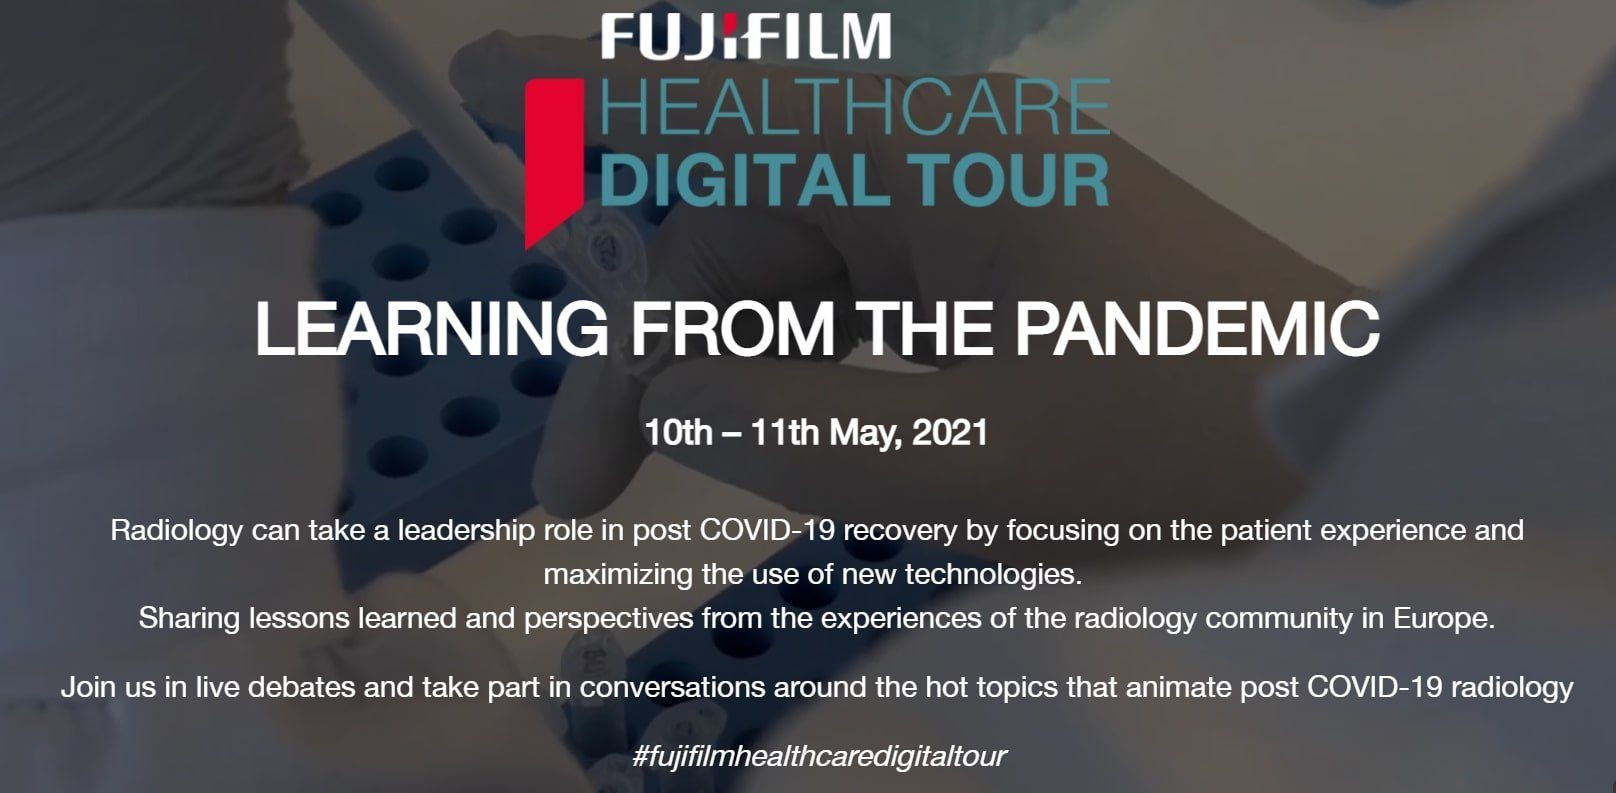 Digital tour